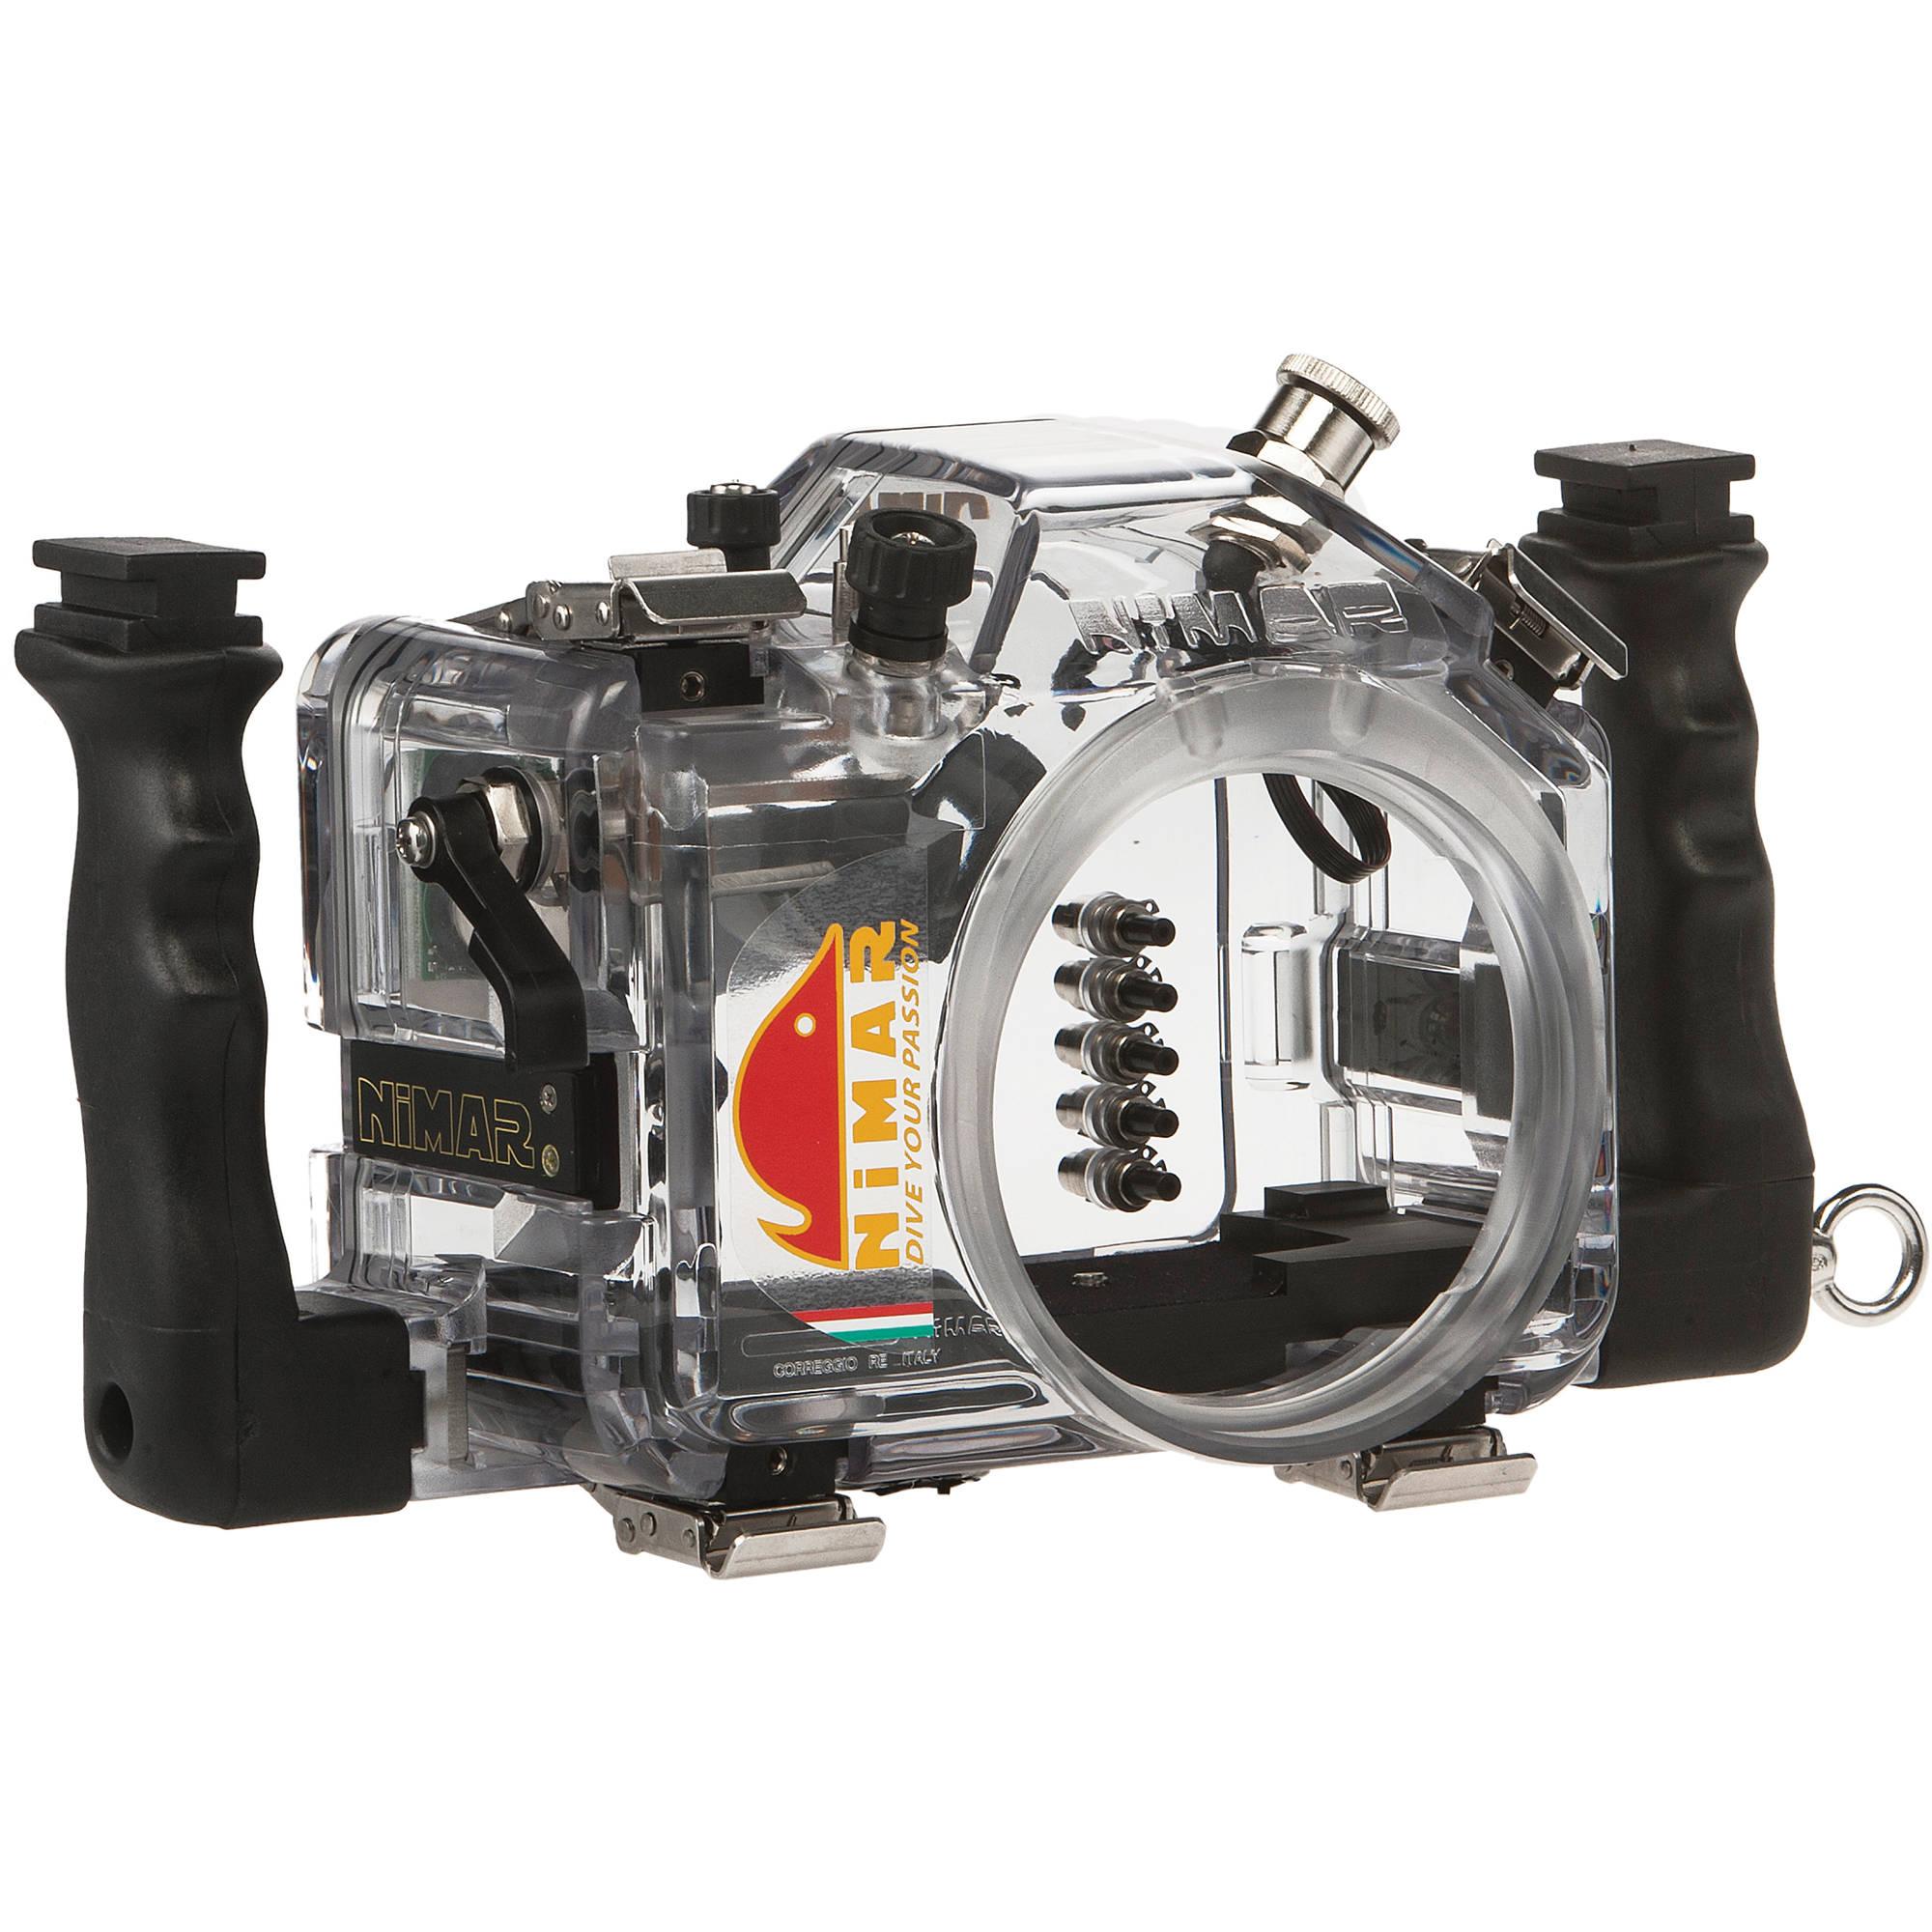 Camera Dslr Camera Without Lens nimar underwater housing for nikon d3200 dslr camera nid3200 bh without lens port